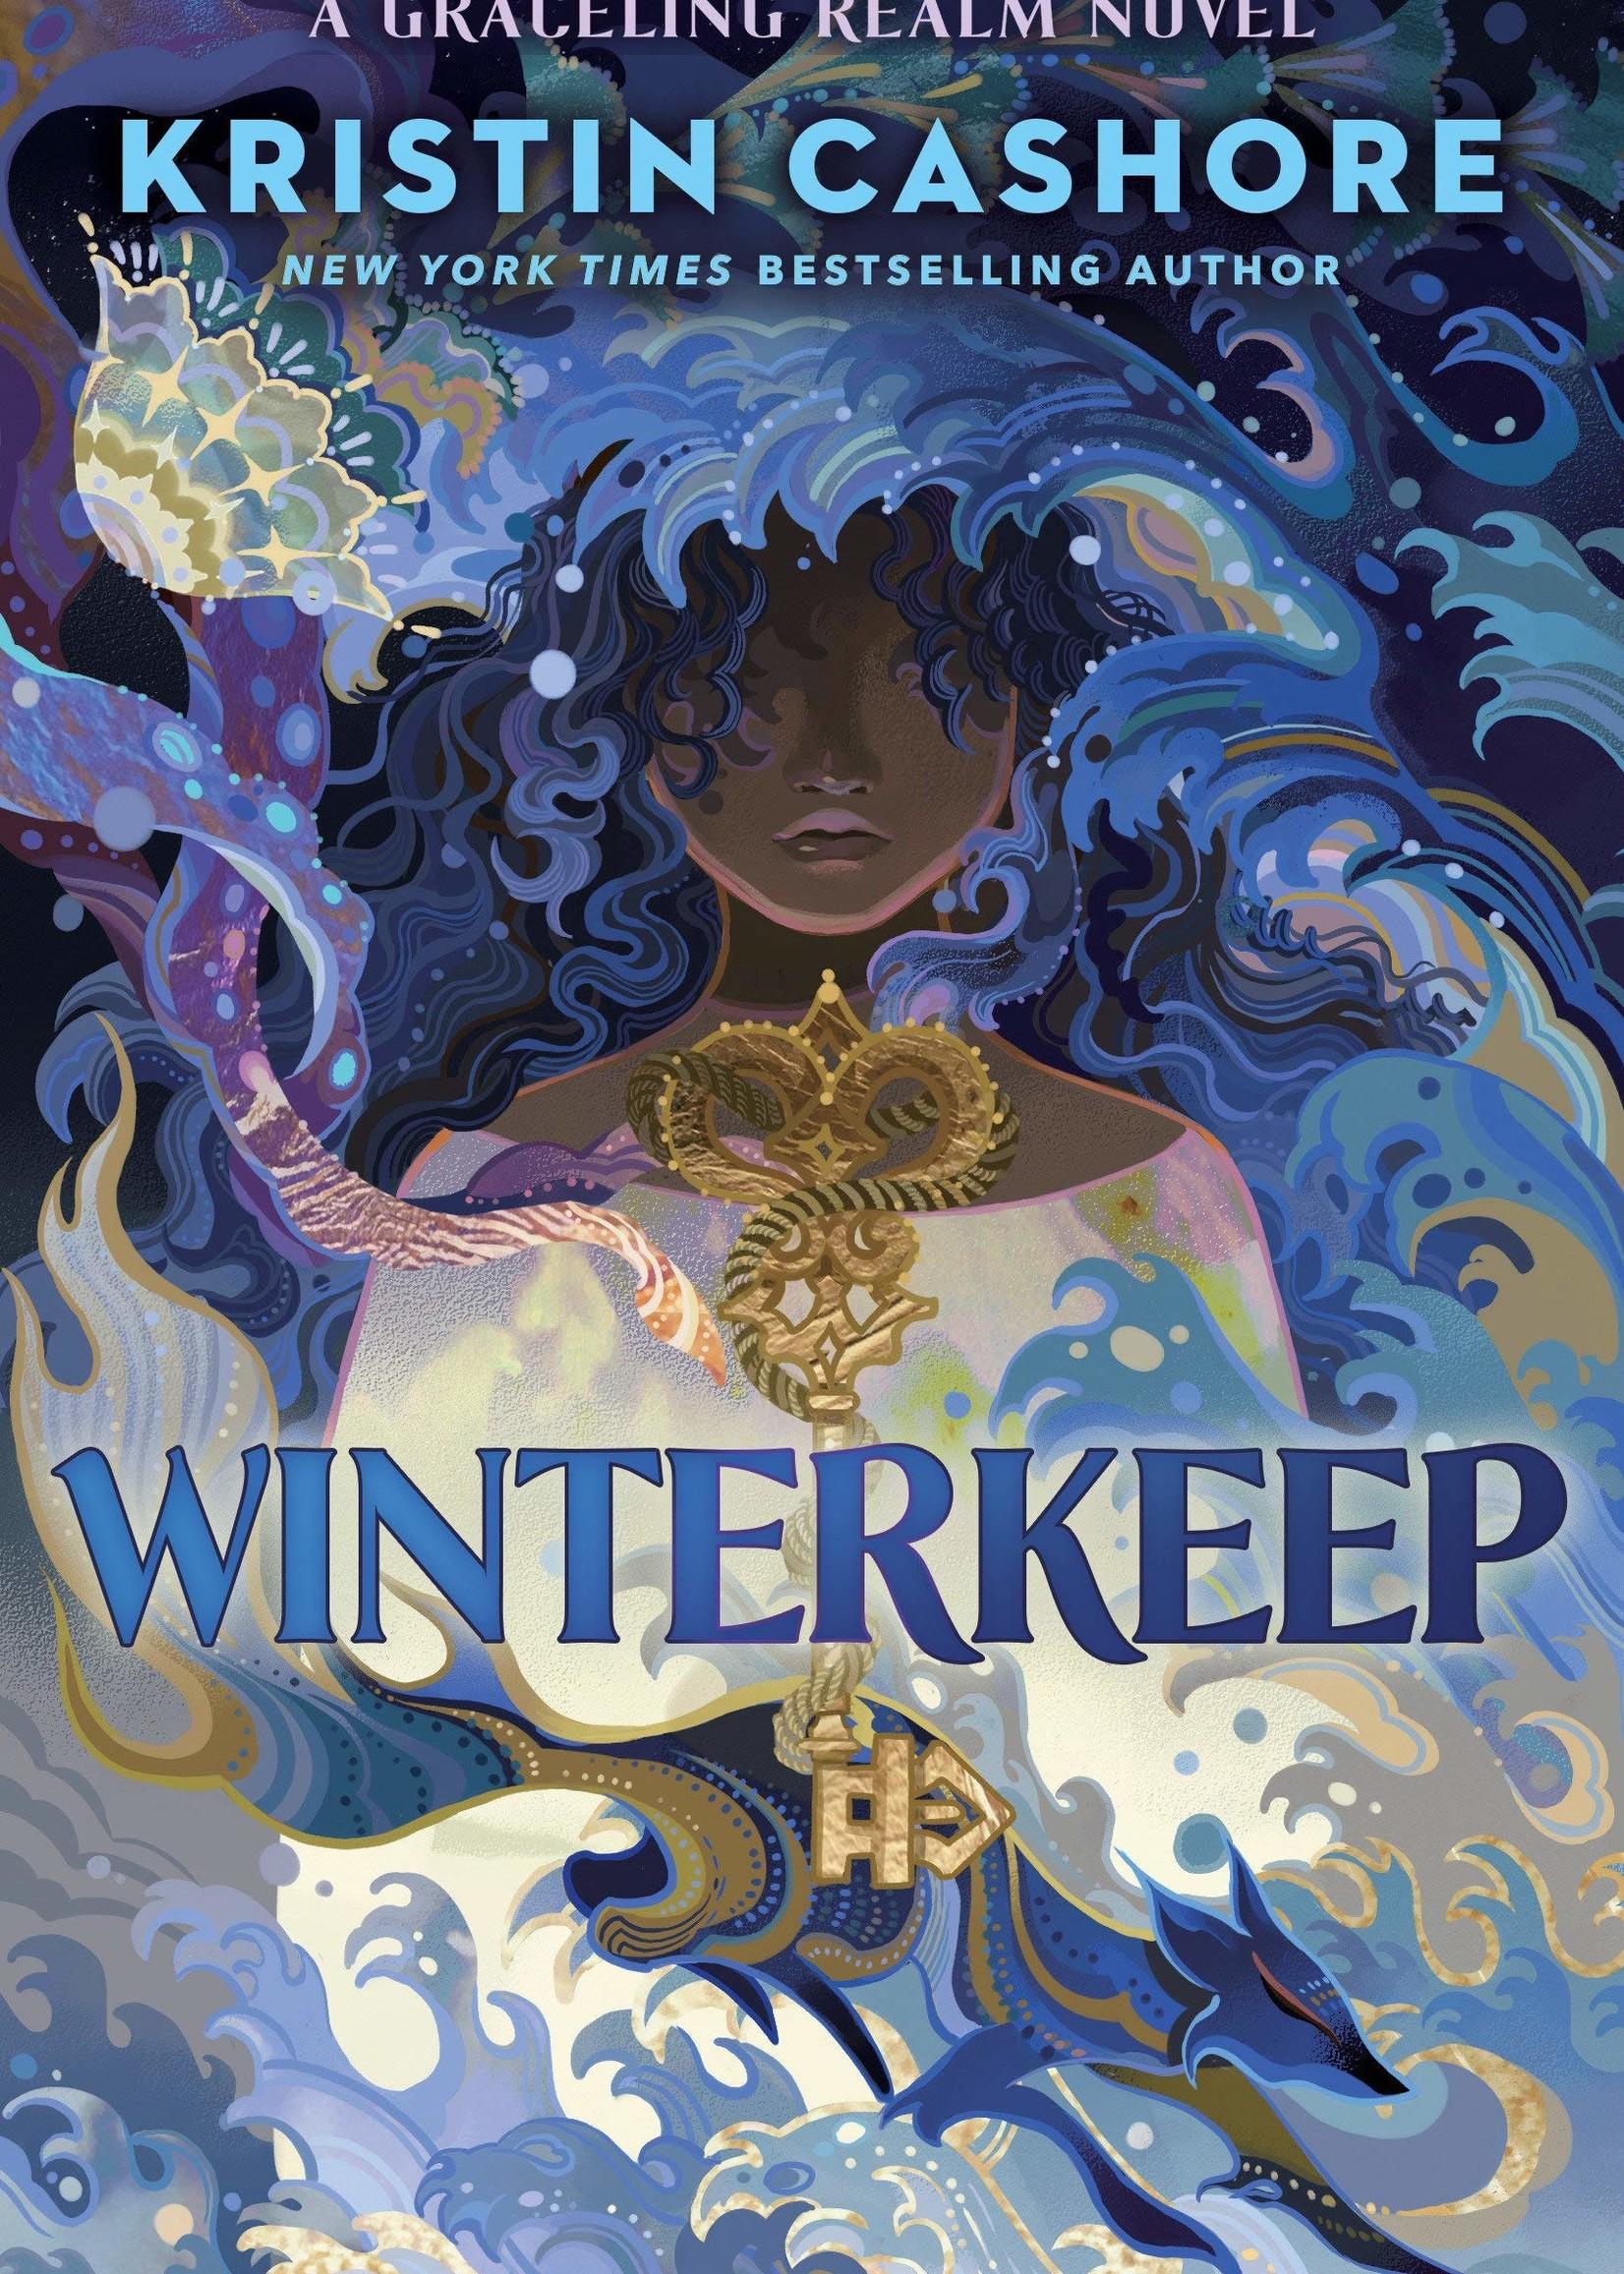 Graceling Realm #04, Winterkeep - Hardcover